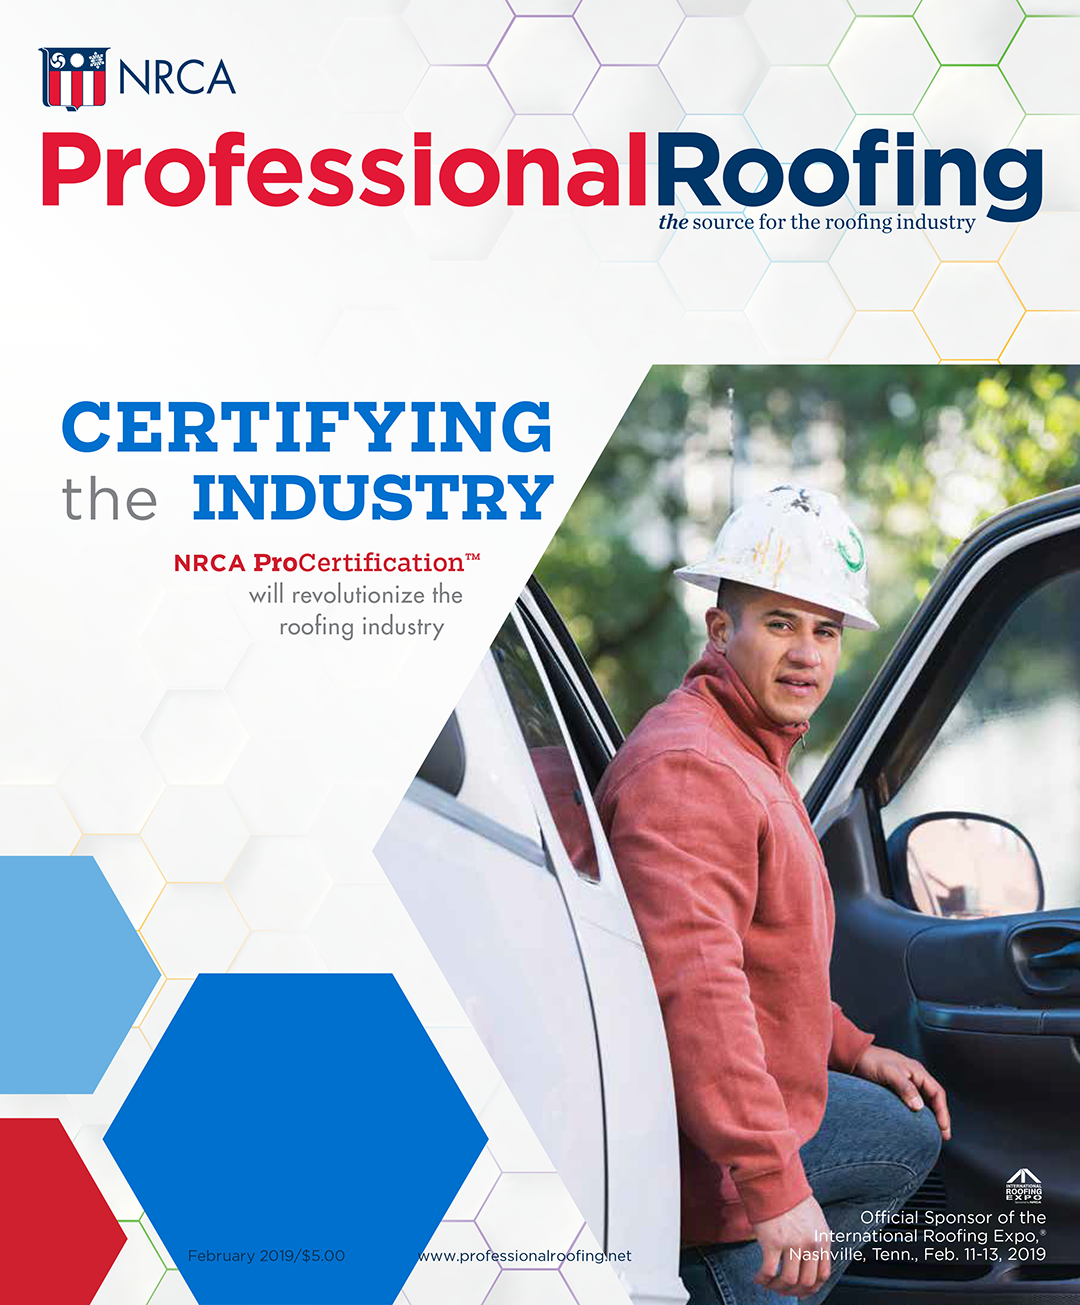 Professional Roofing Magazine 2/1/2019